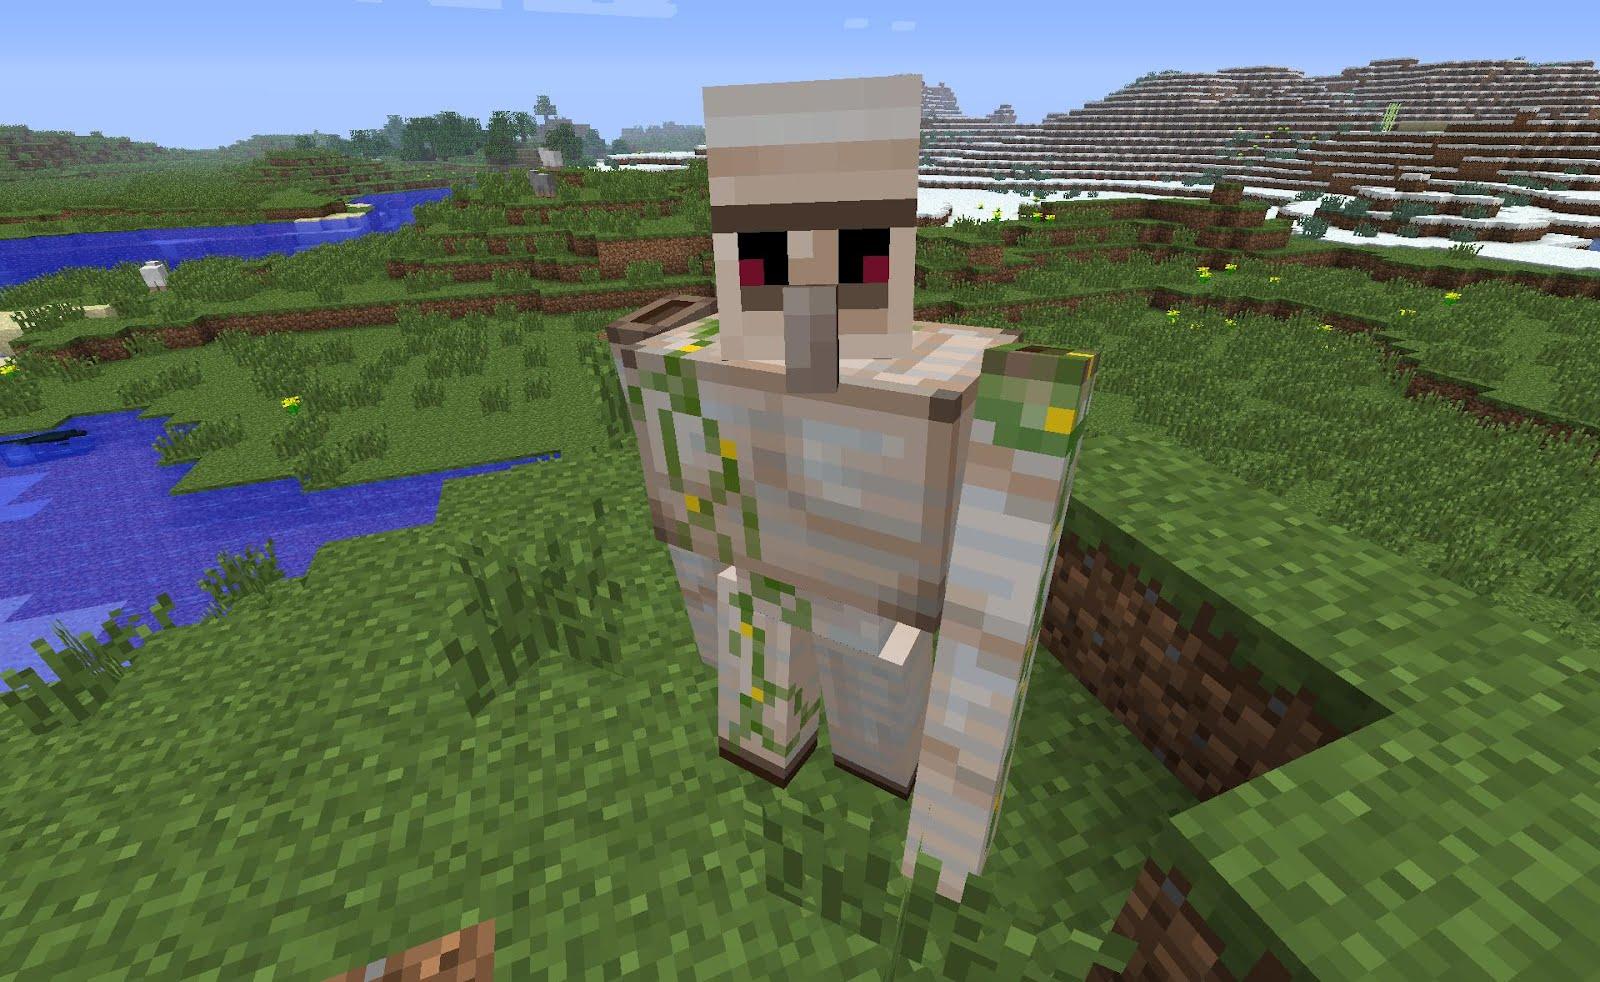 Minecraft 1 2 golem de fer iron golem minecraft france - Minecraft golem de fer ...